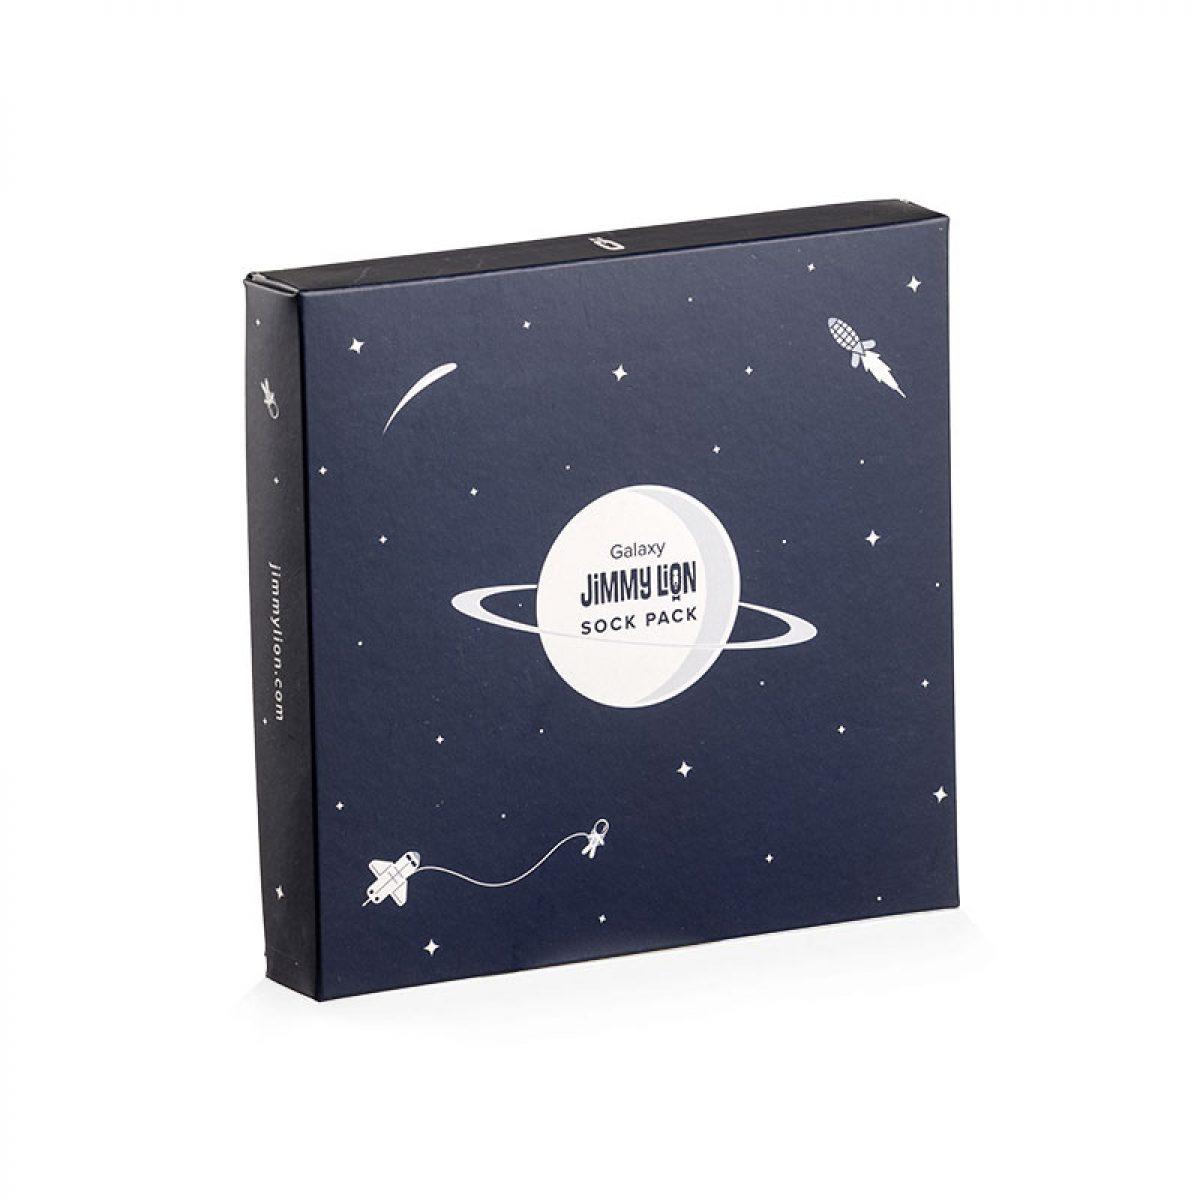 Personalised cardboard boxes printed on both sides